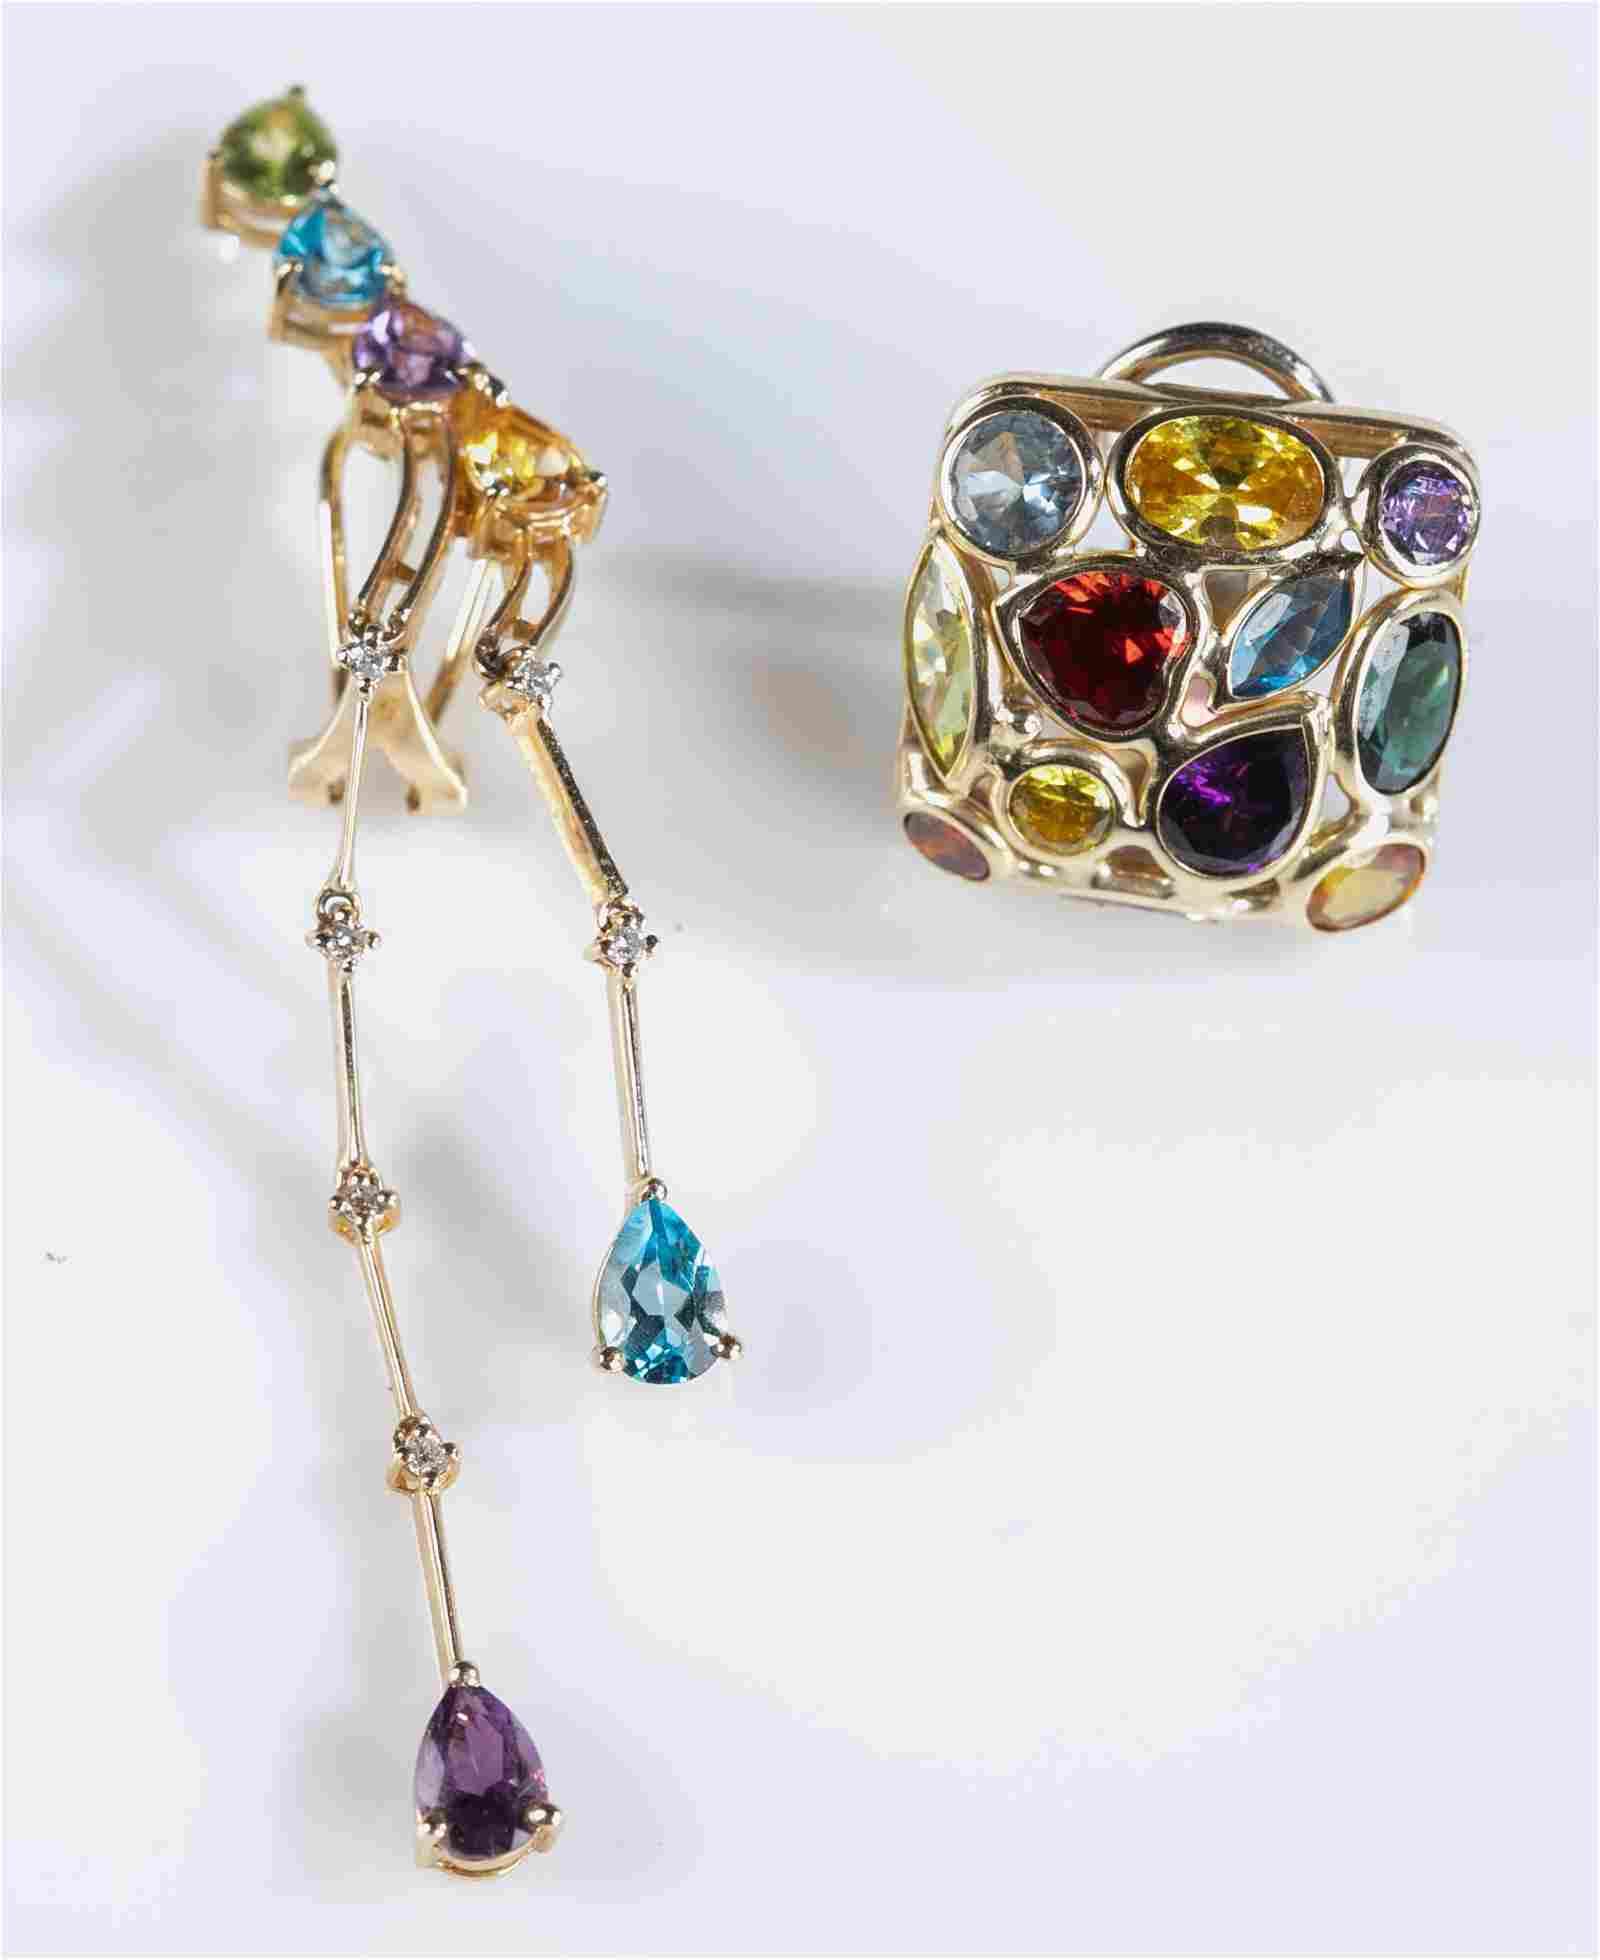 2 14k Gold clip on earrings.